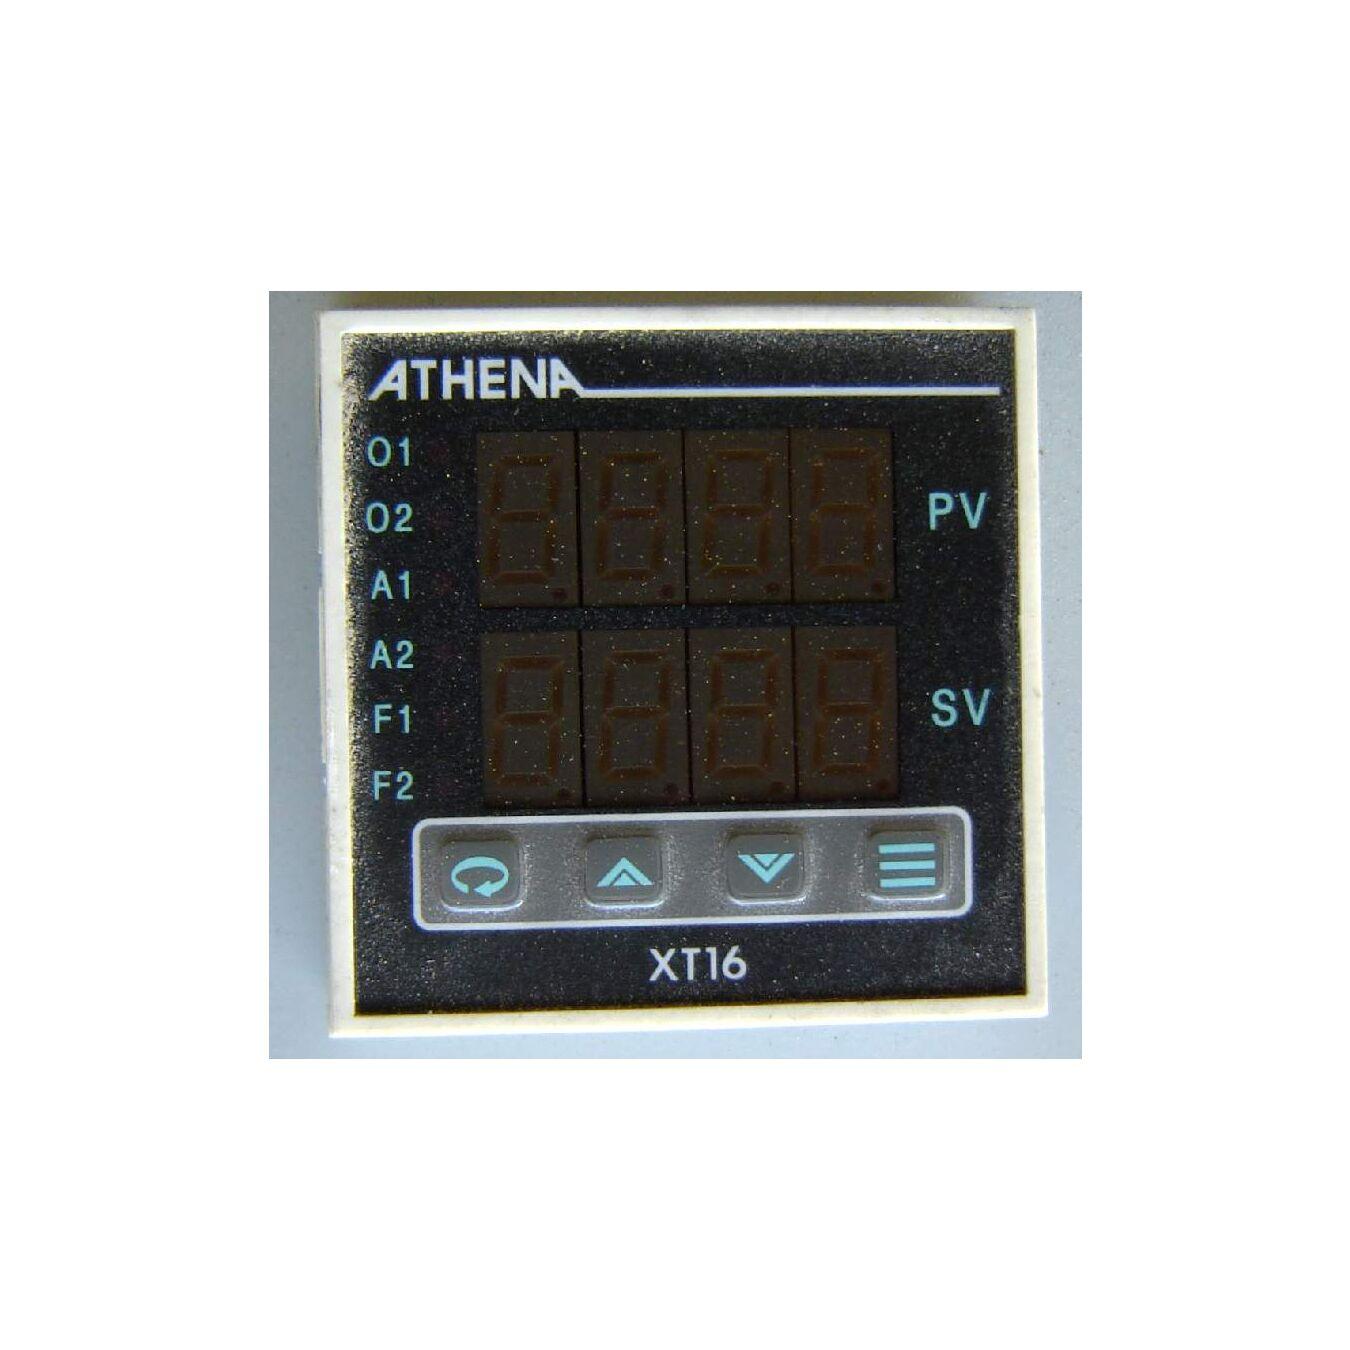 Indeeco Athena Heating Element Power Control Panel Heat